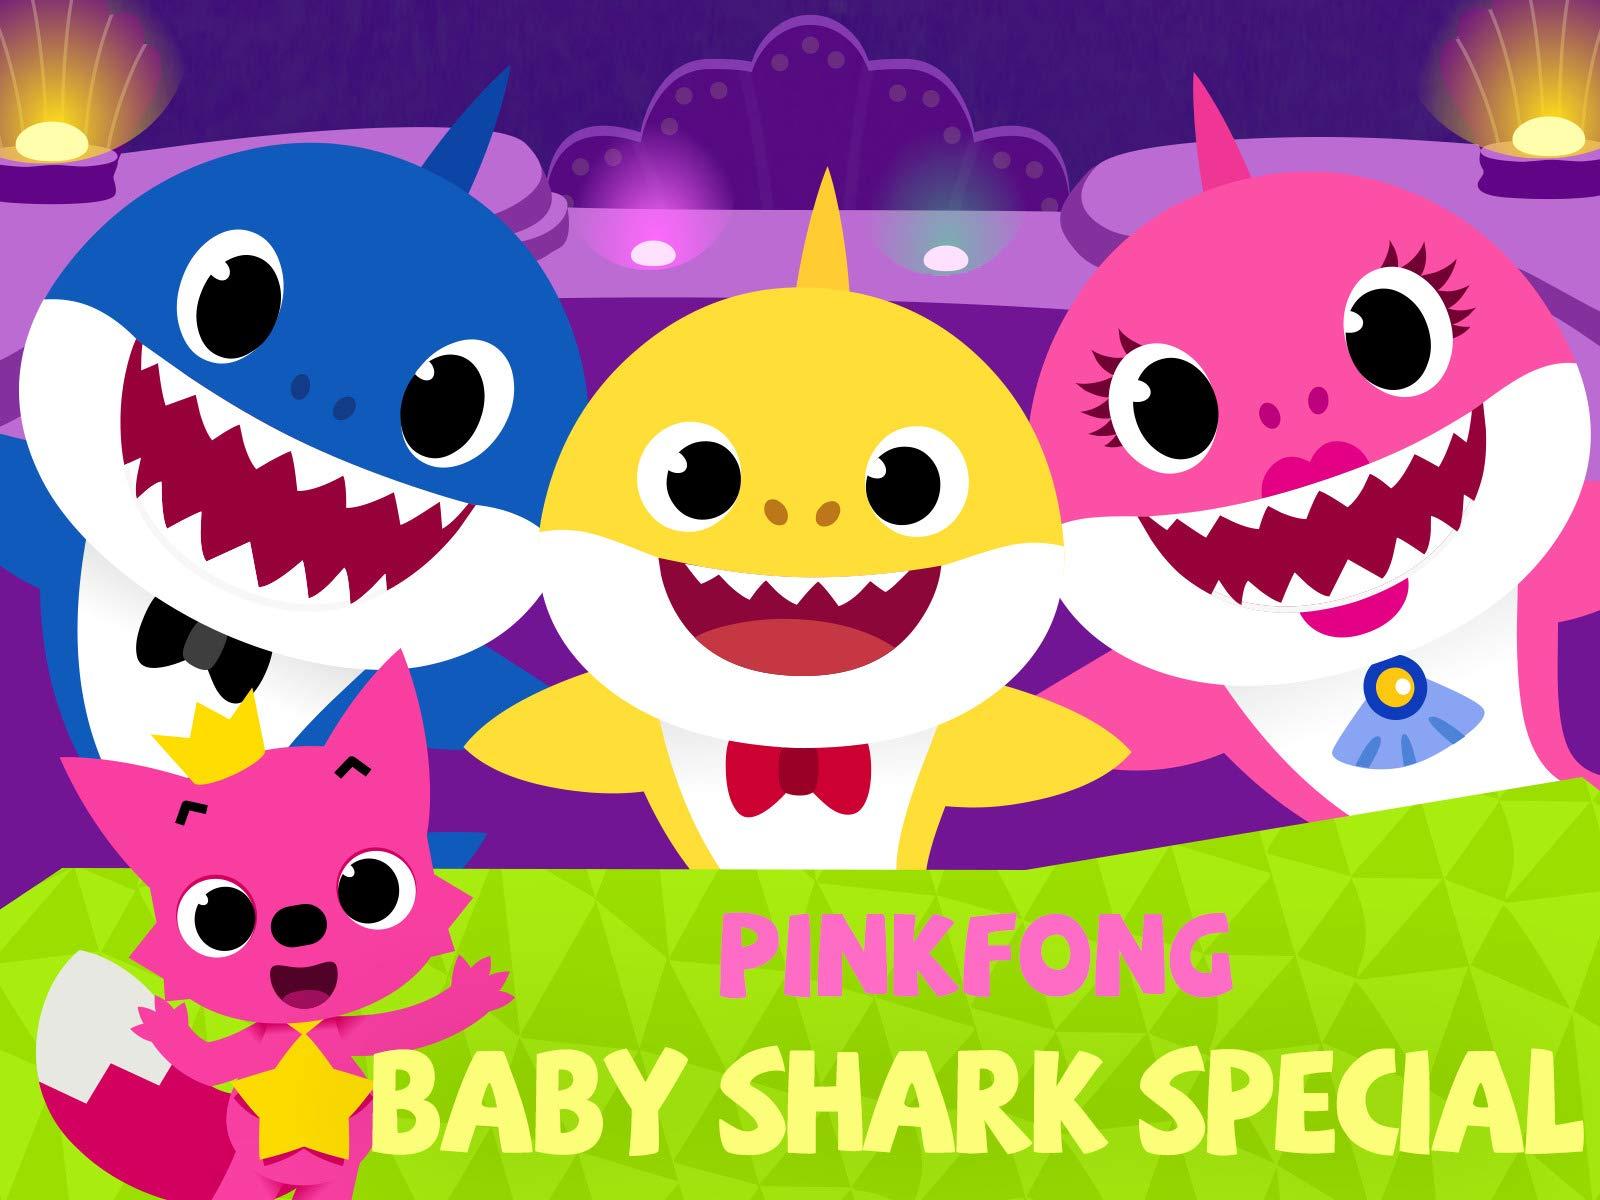 Amazoncom Pinkfong Baby Shark Special Pinkfong Amazon